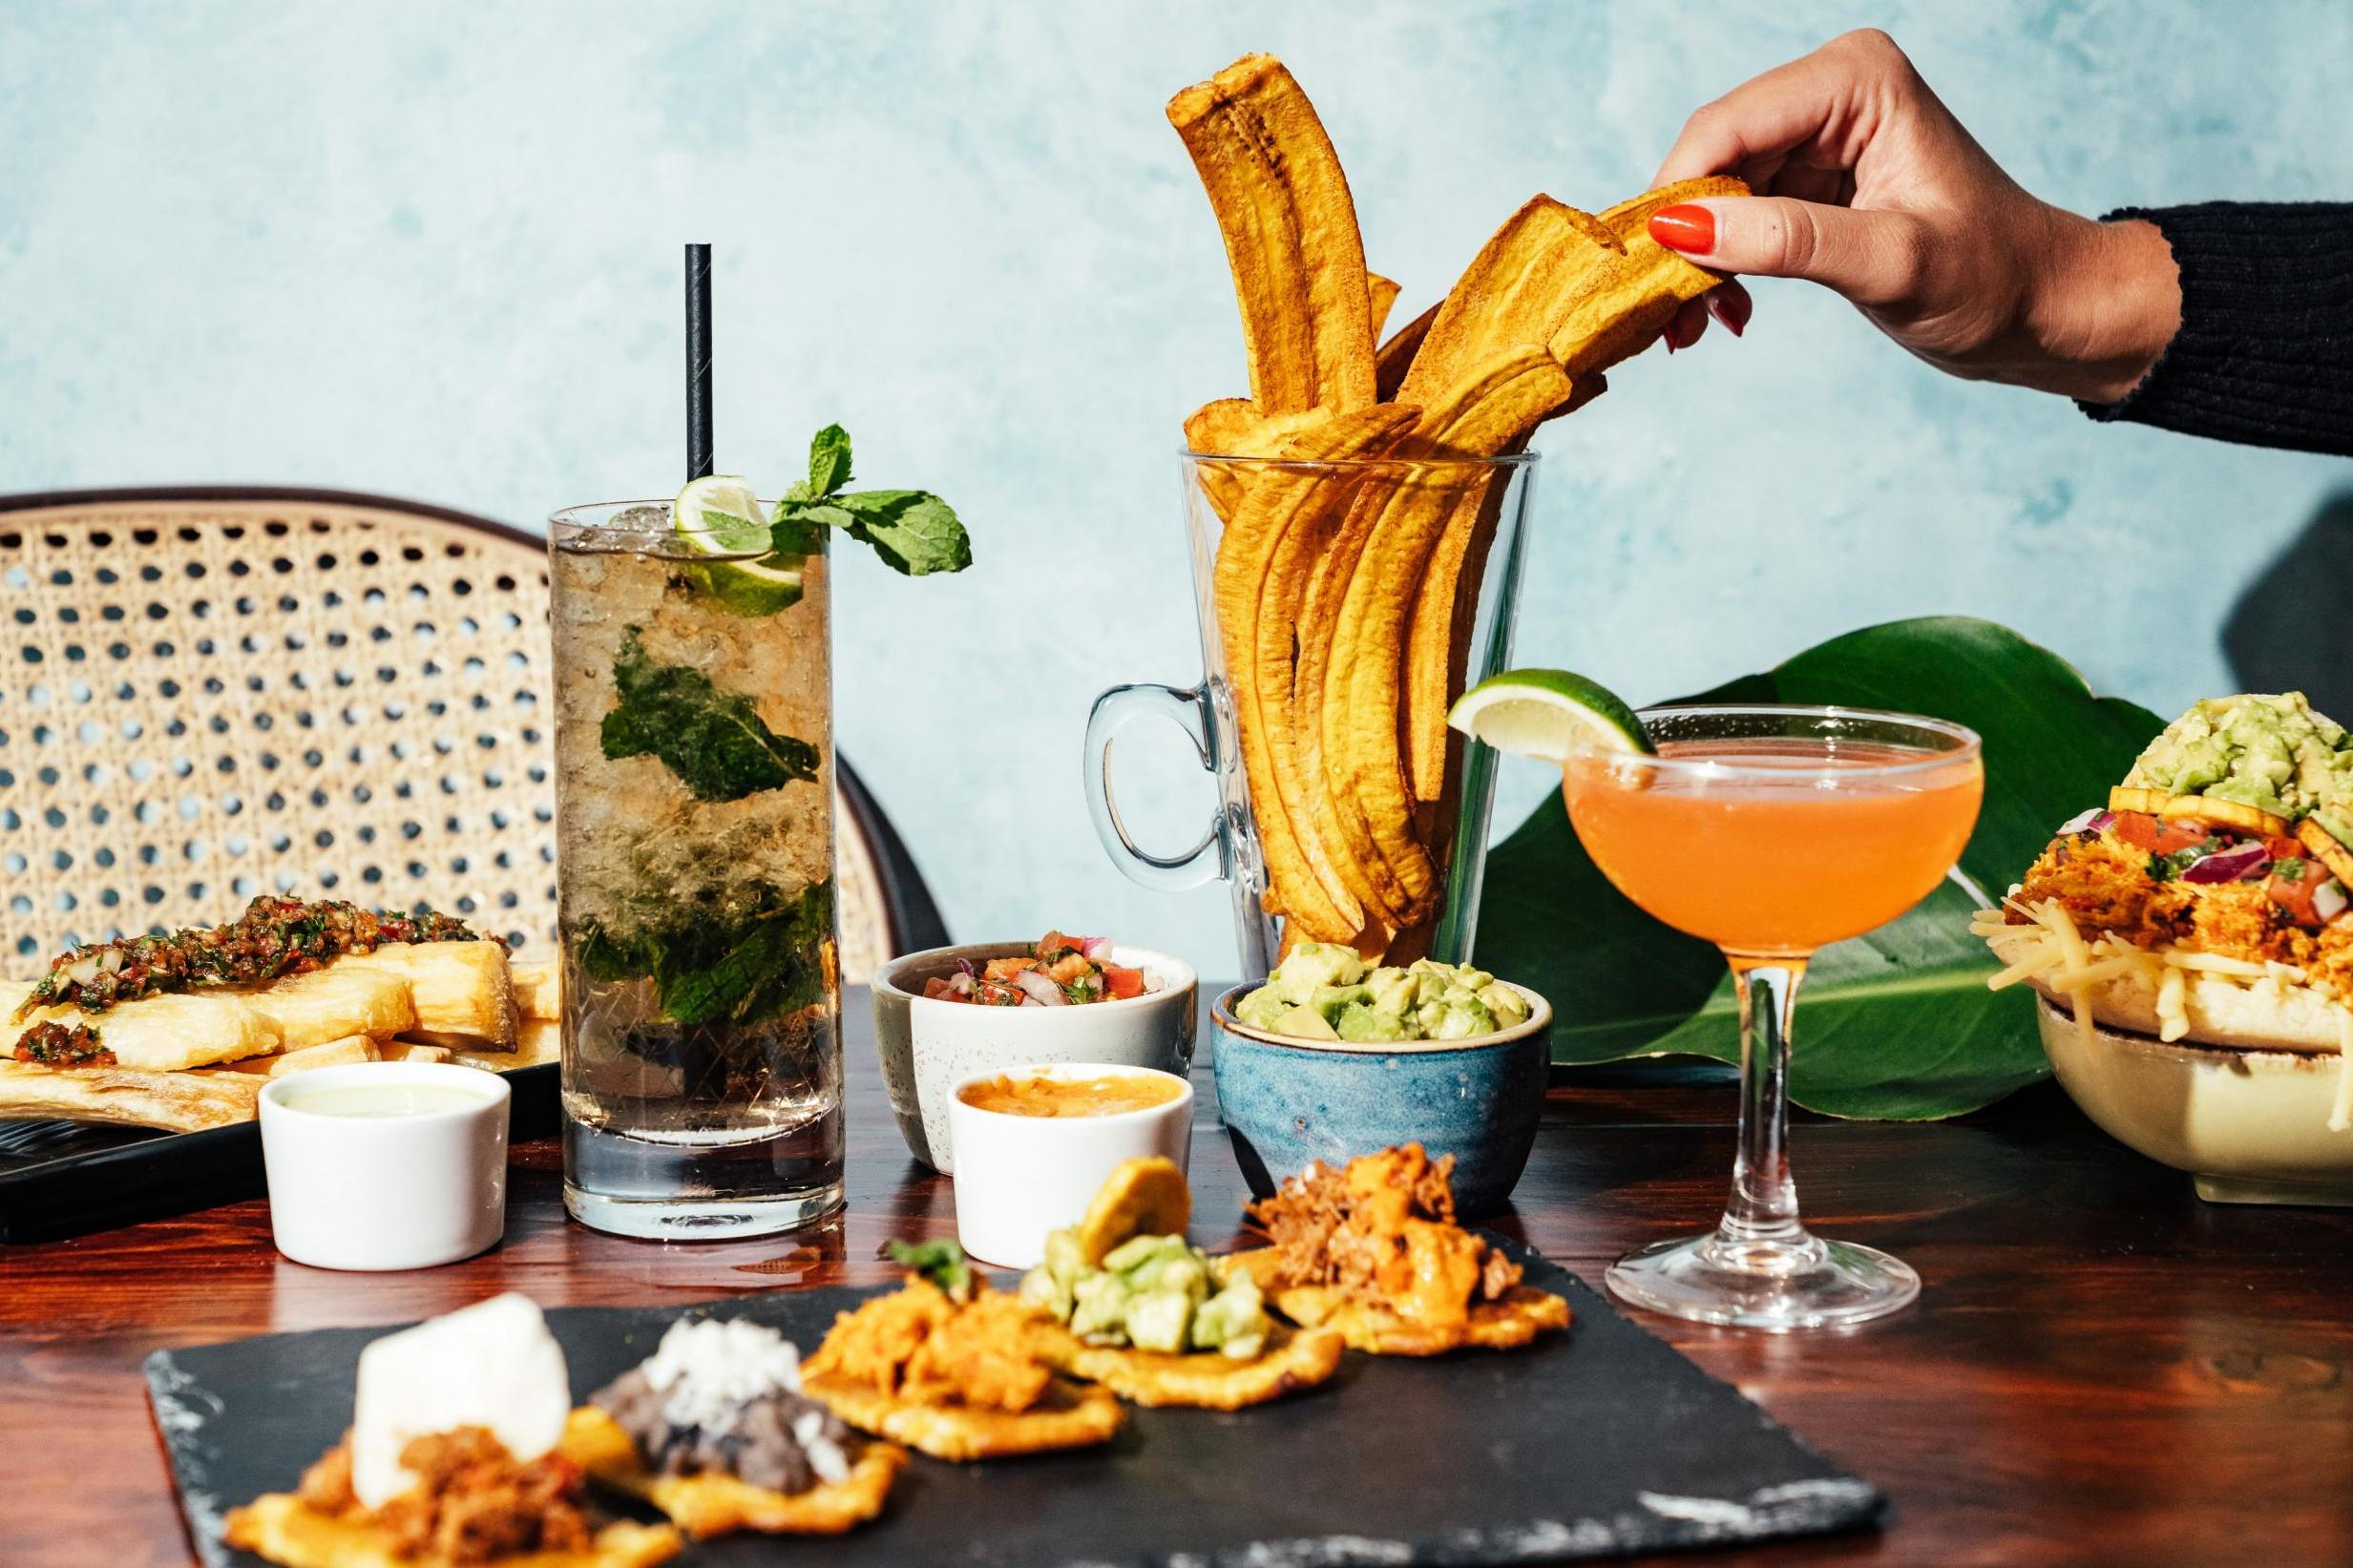 first-look:-bar-bolivar,-the-canary-wharf-spot-inspired-by-50s-cuba